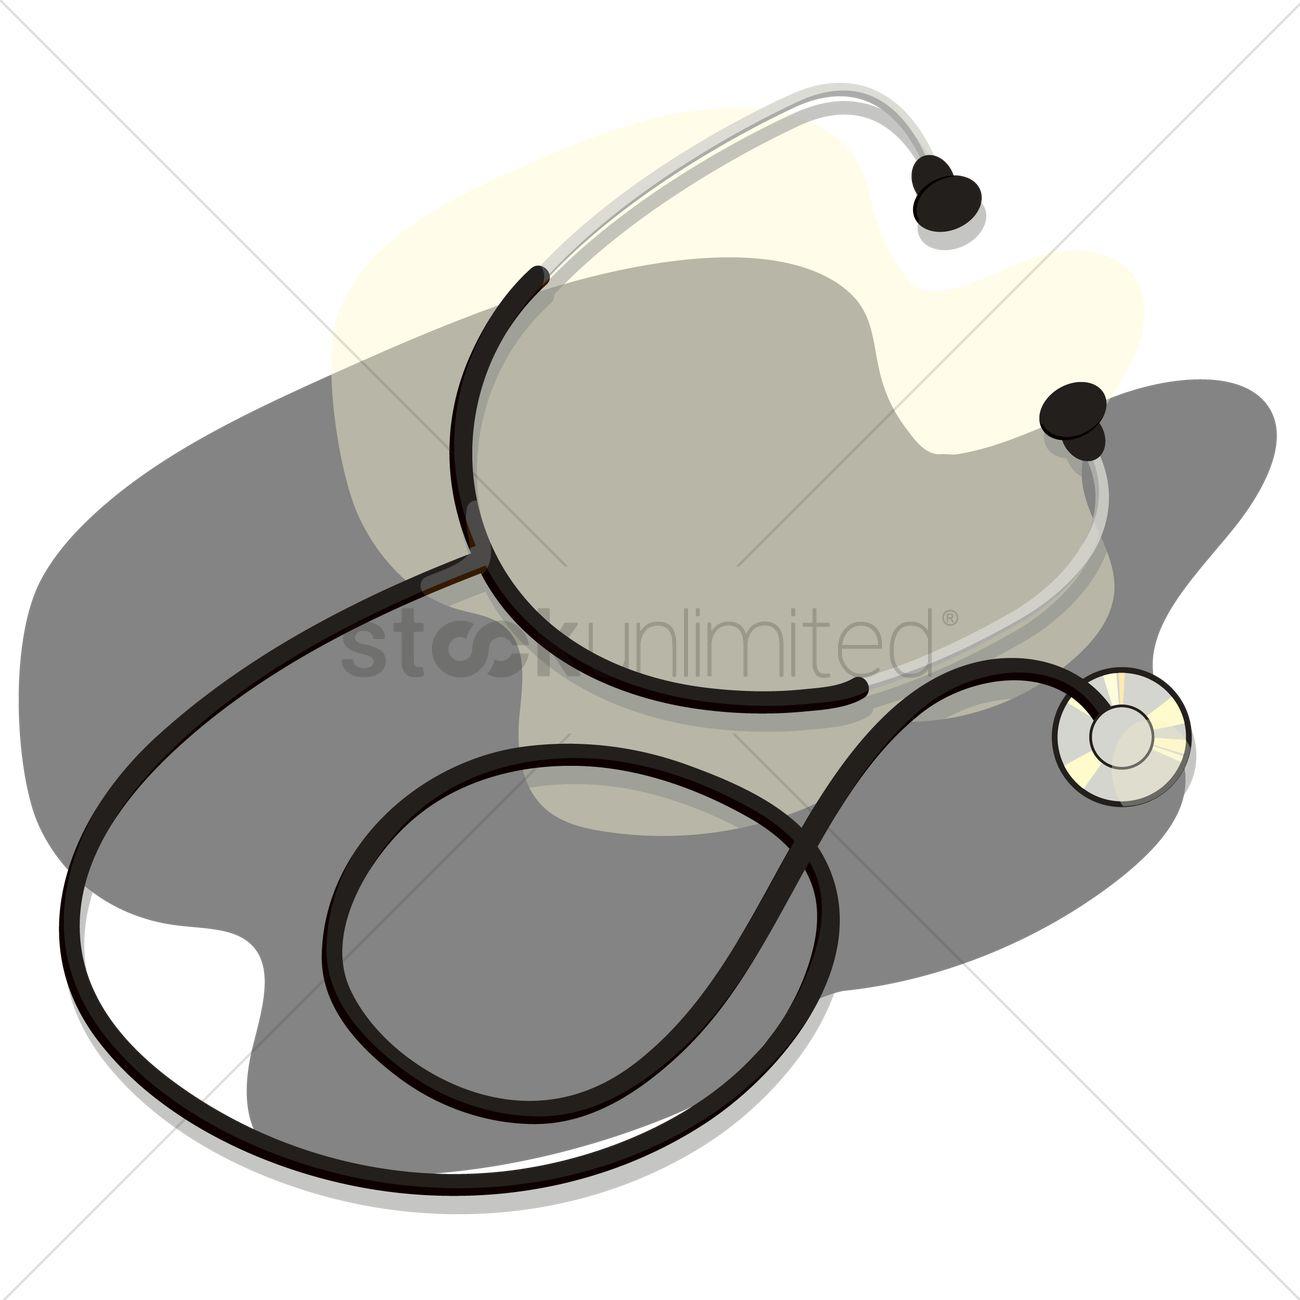 1300x1300 Free Stethoscope Vector Image